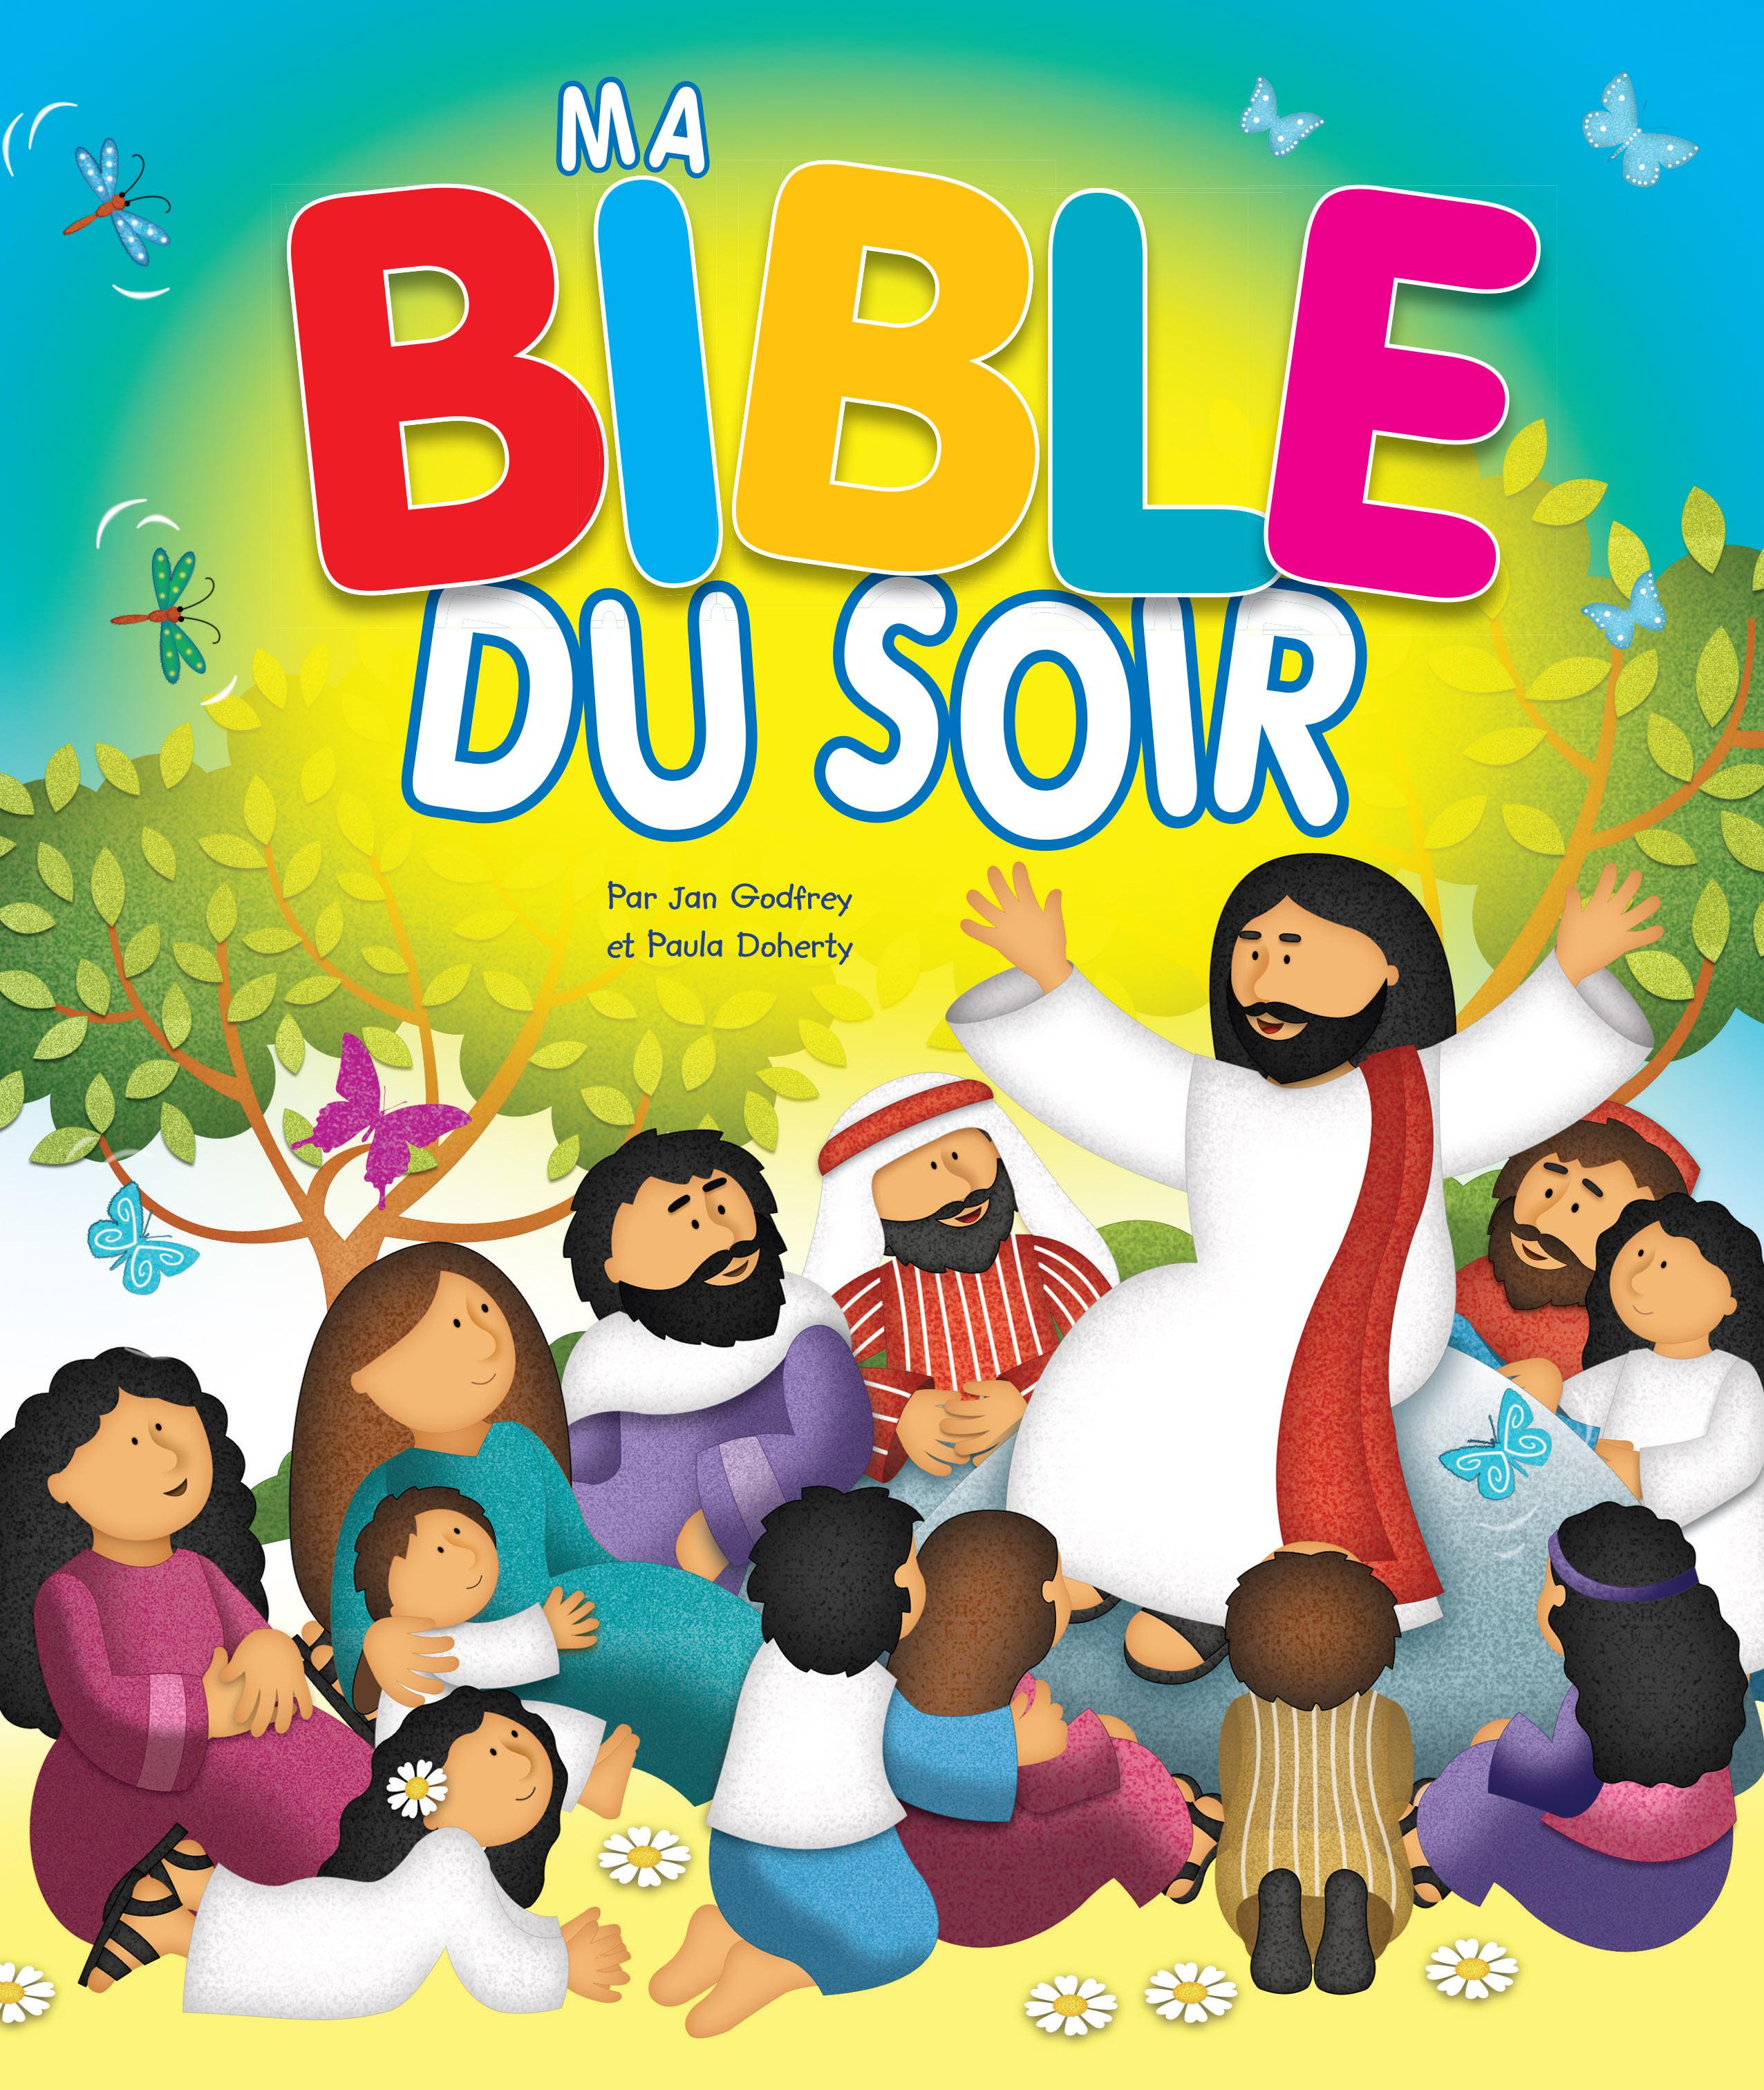 MA BIBLE DU SOIR